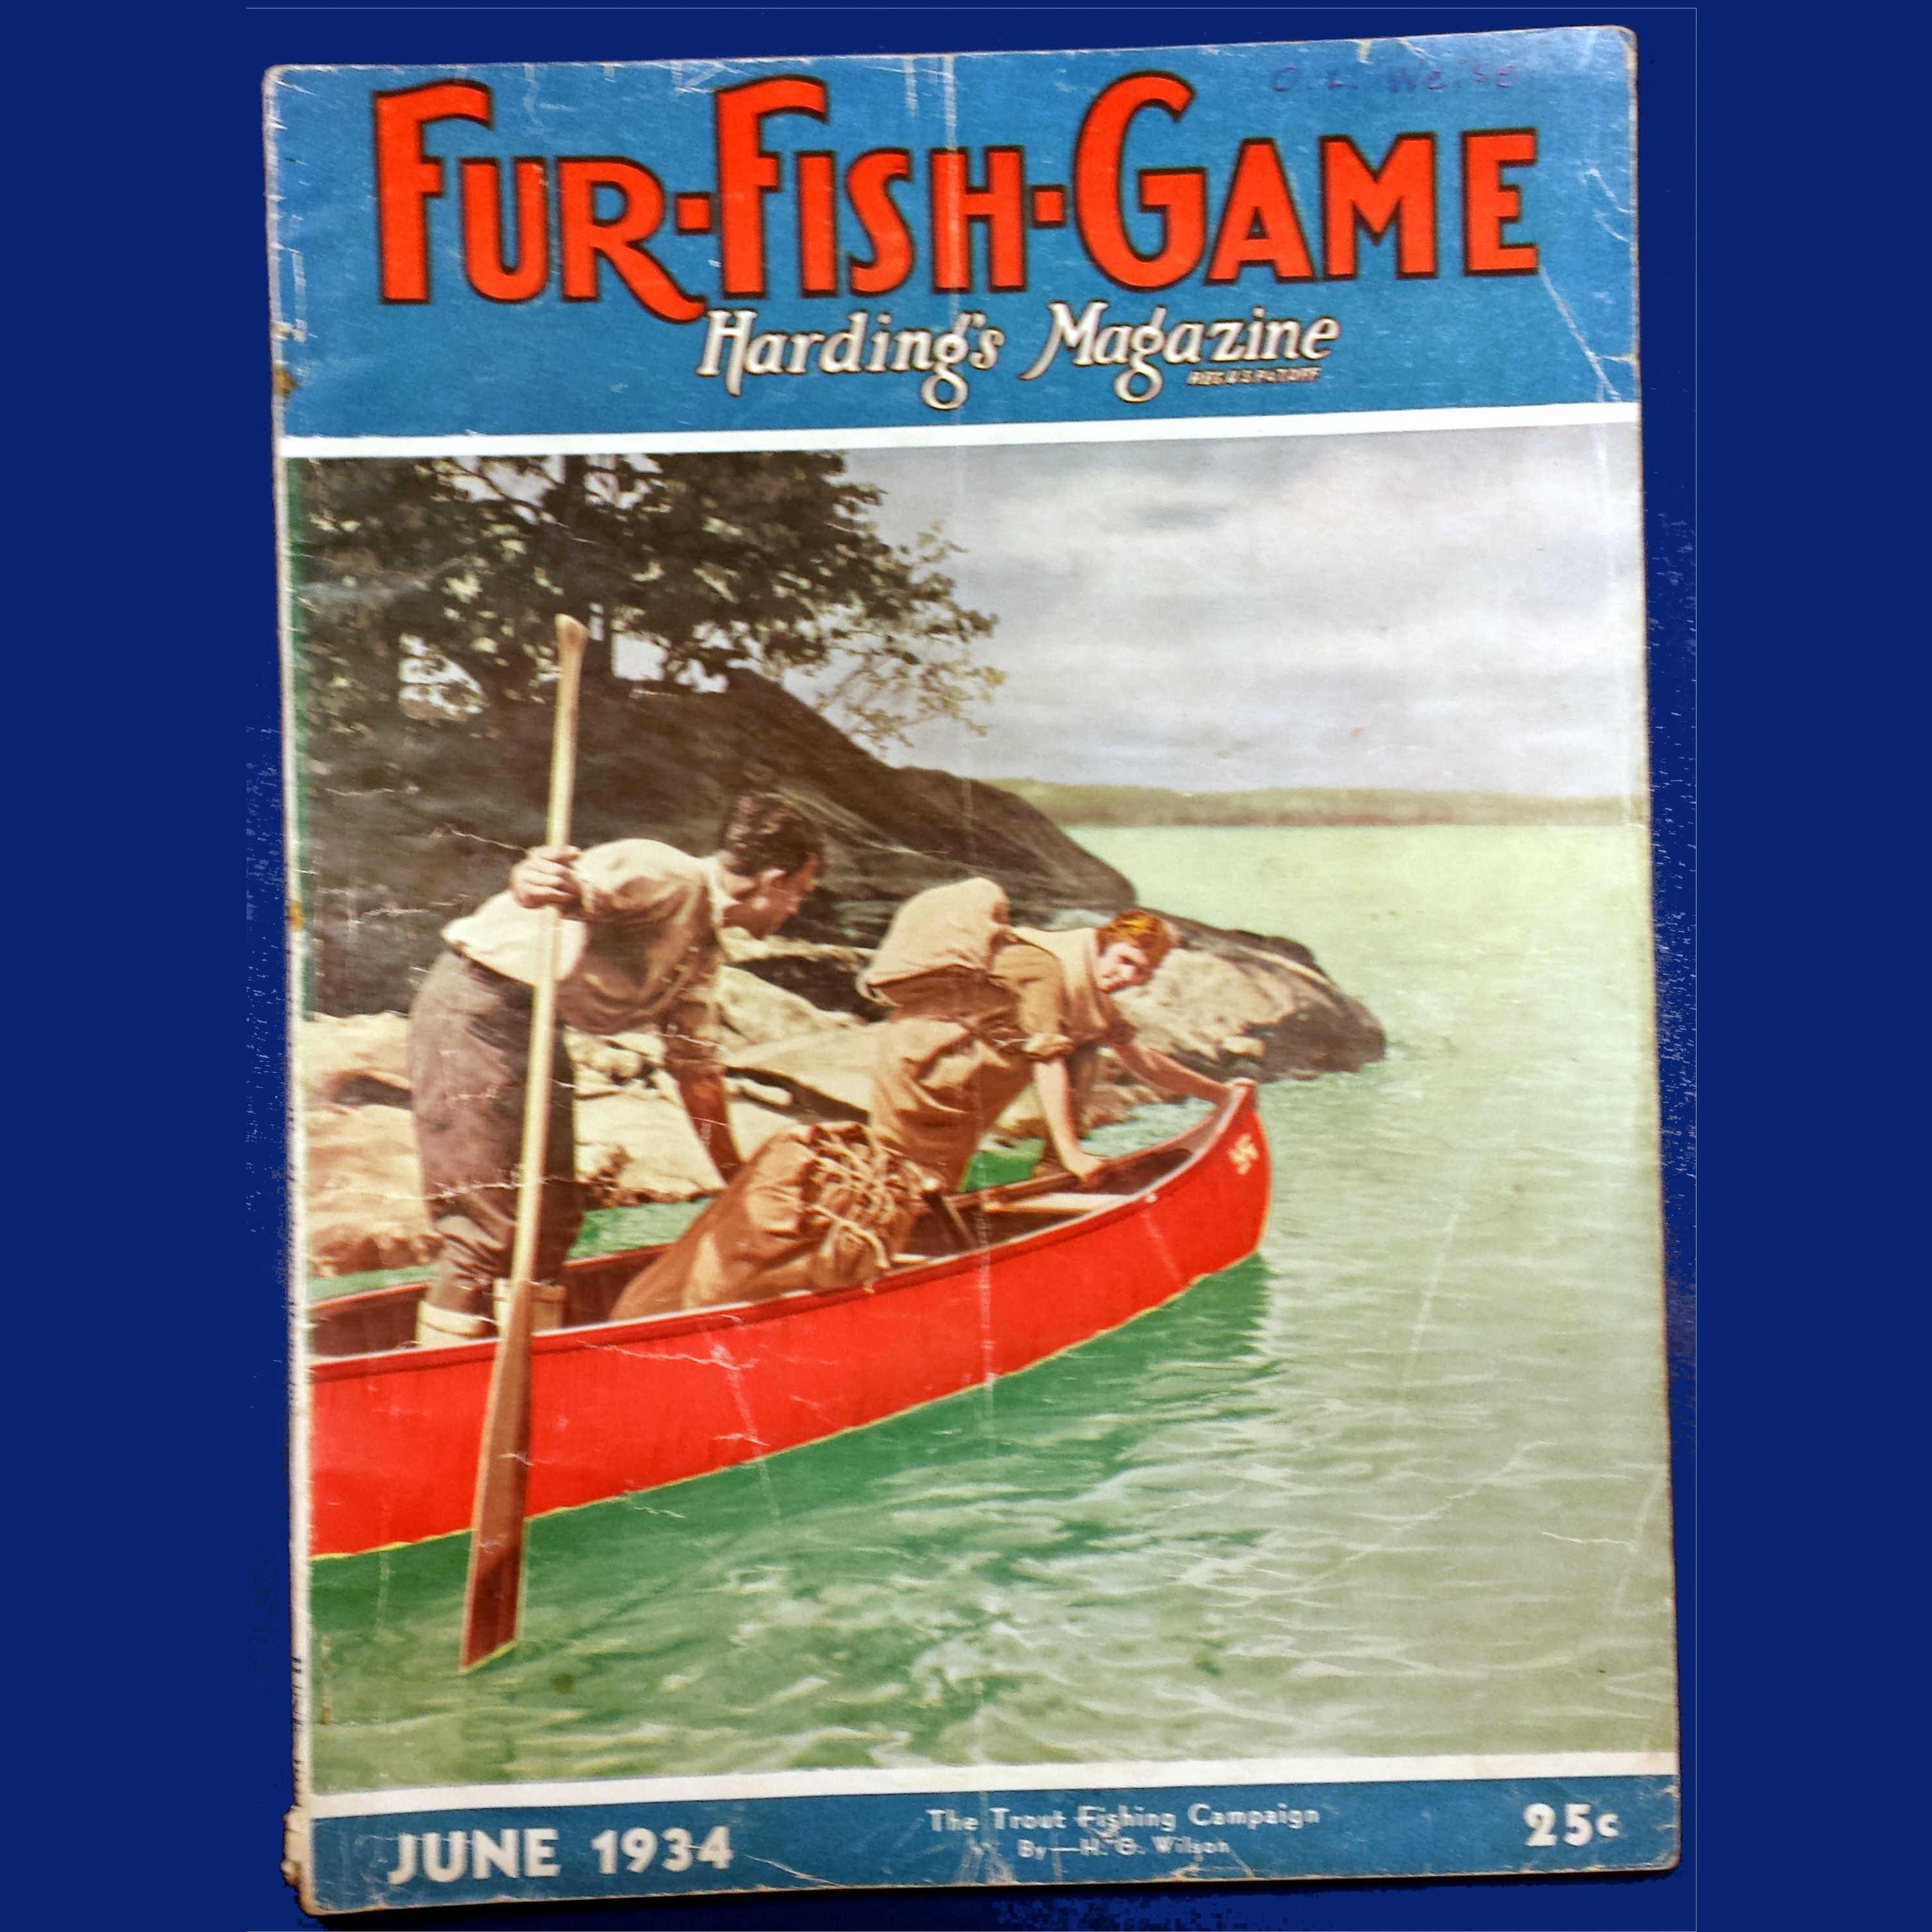 Fur fish game harding s magazine 1934 arthur robert for Fur fish and game